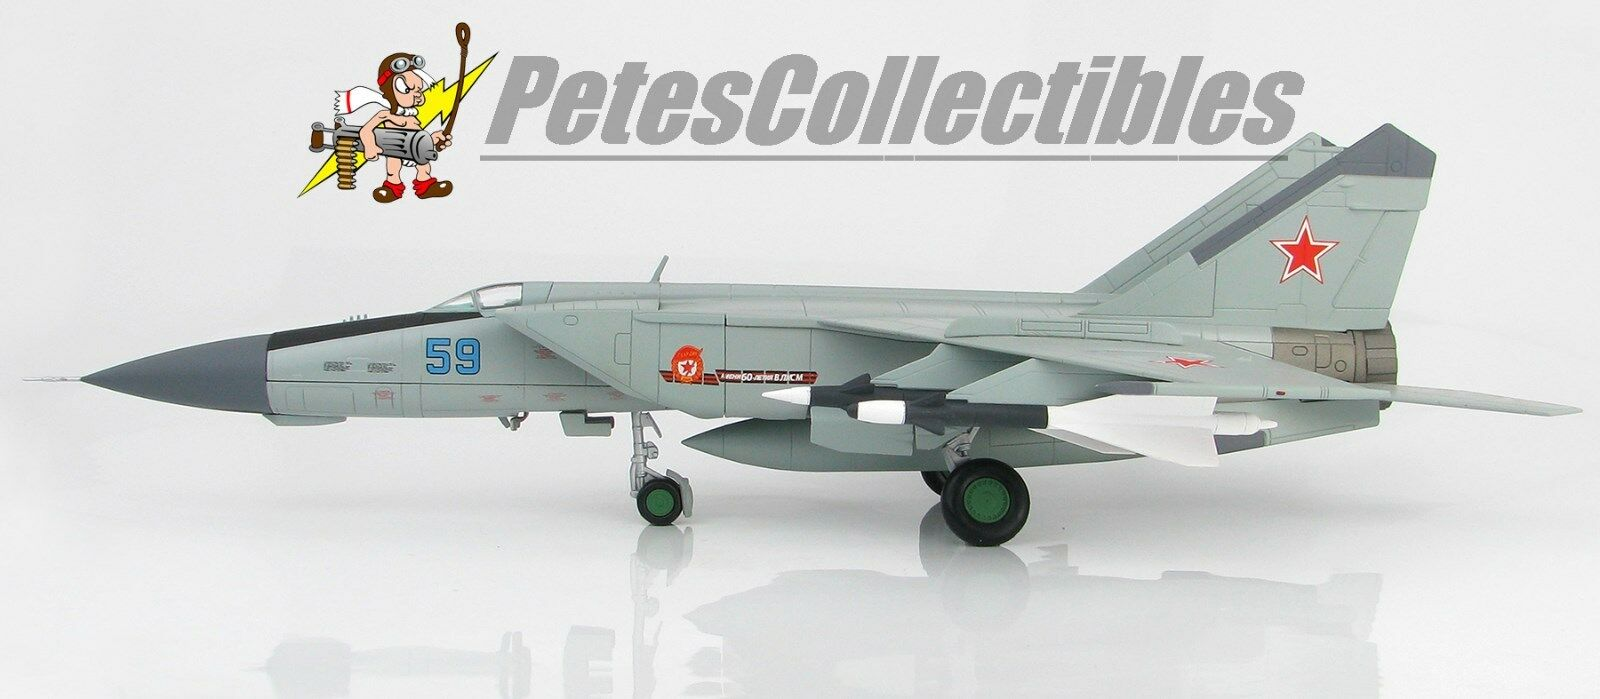 HOBBY MASTER HA5604 MIG-25PDS Foxbat Fighter bluee 59 146th GvIAP 8th USSR A.D.A.